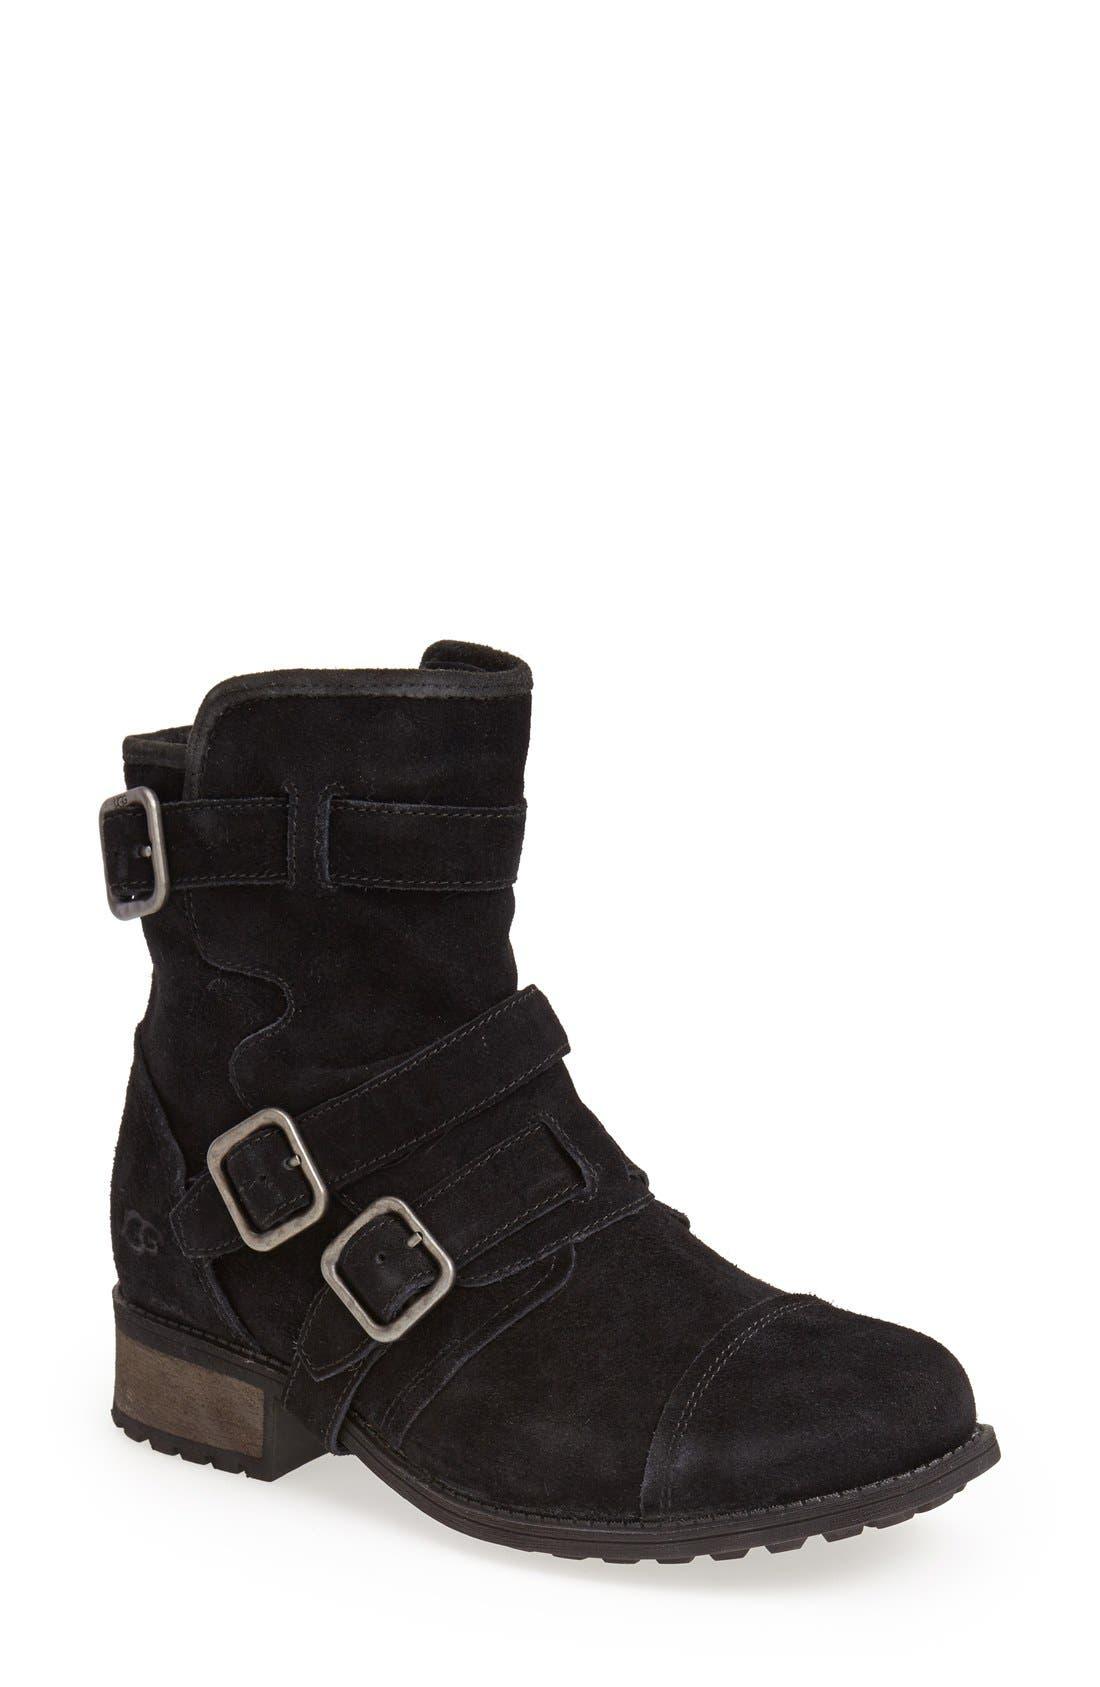 Main Image - UGG® Australia 'Finney' Suede Moto Boot (Women)